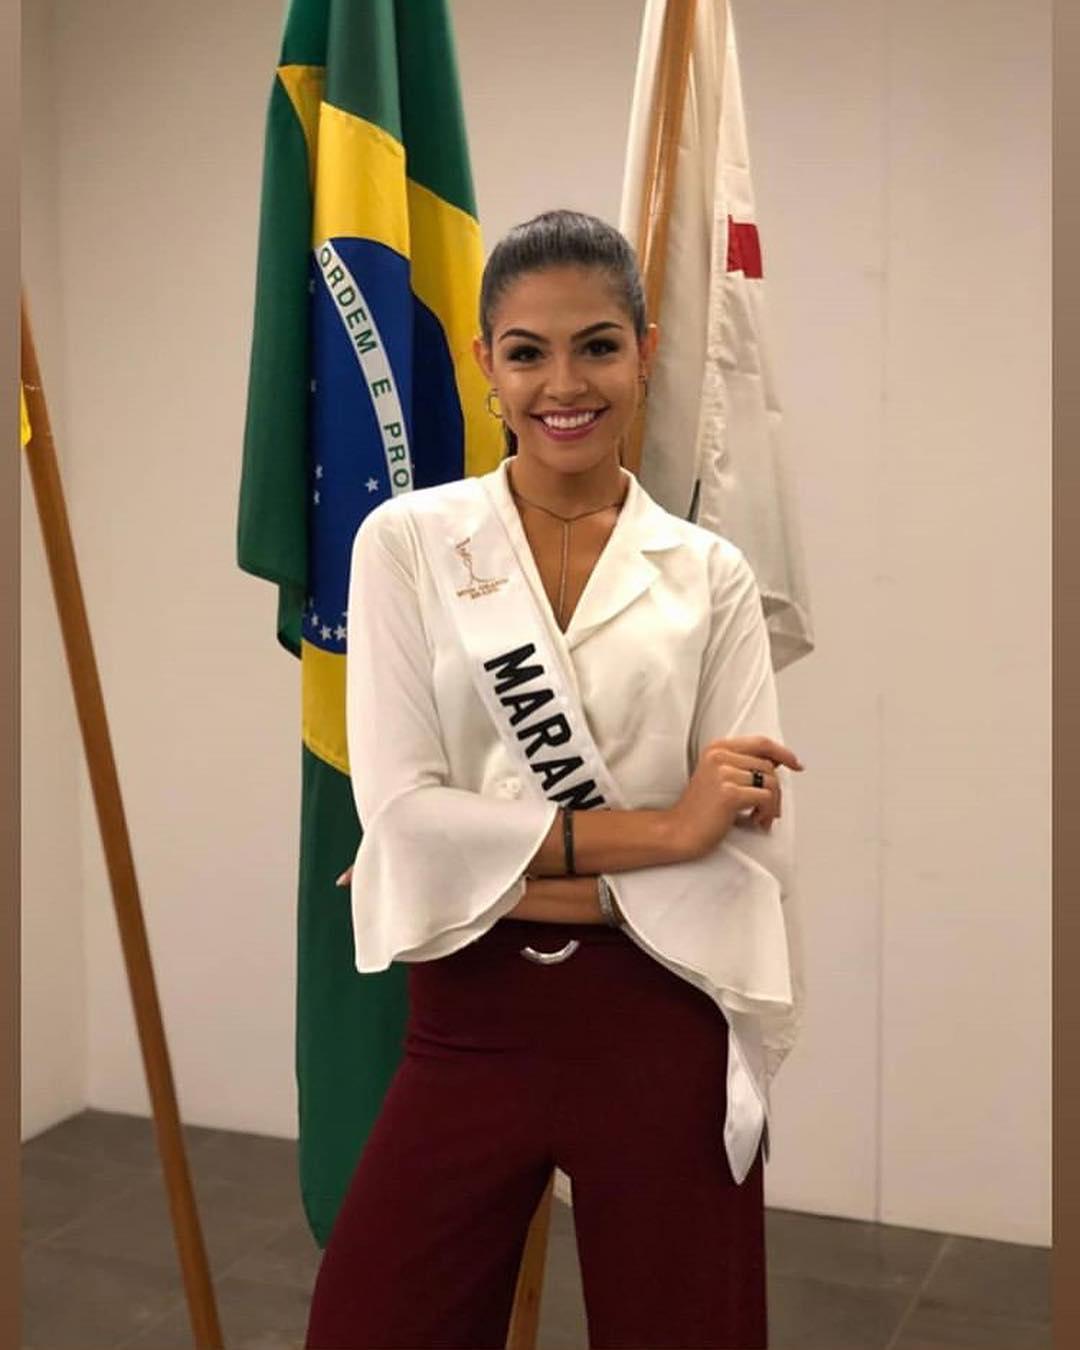 amanda brenner, miss hispanoamericana brasil 2019/top 2 de miss grand brasil 2019/top 2 de rainha da pecuaria internacional 2018. - Página 3 Alex-p48